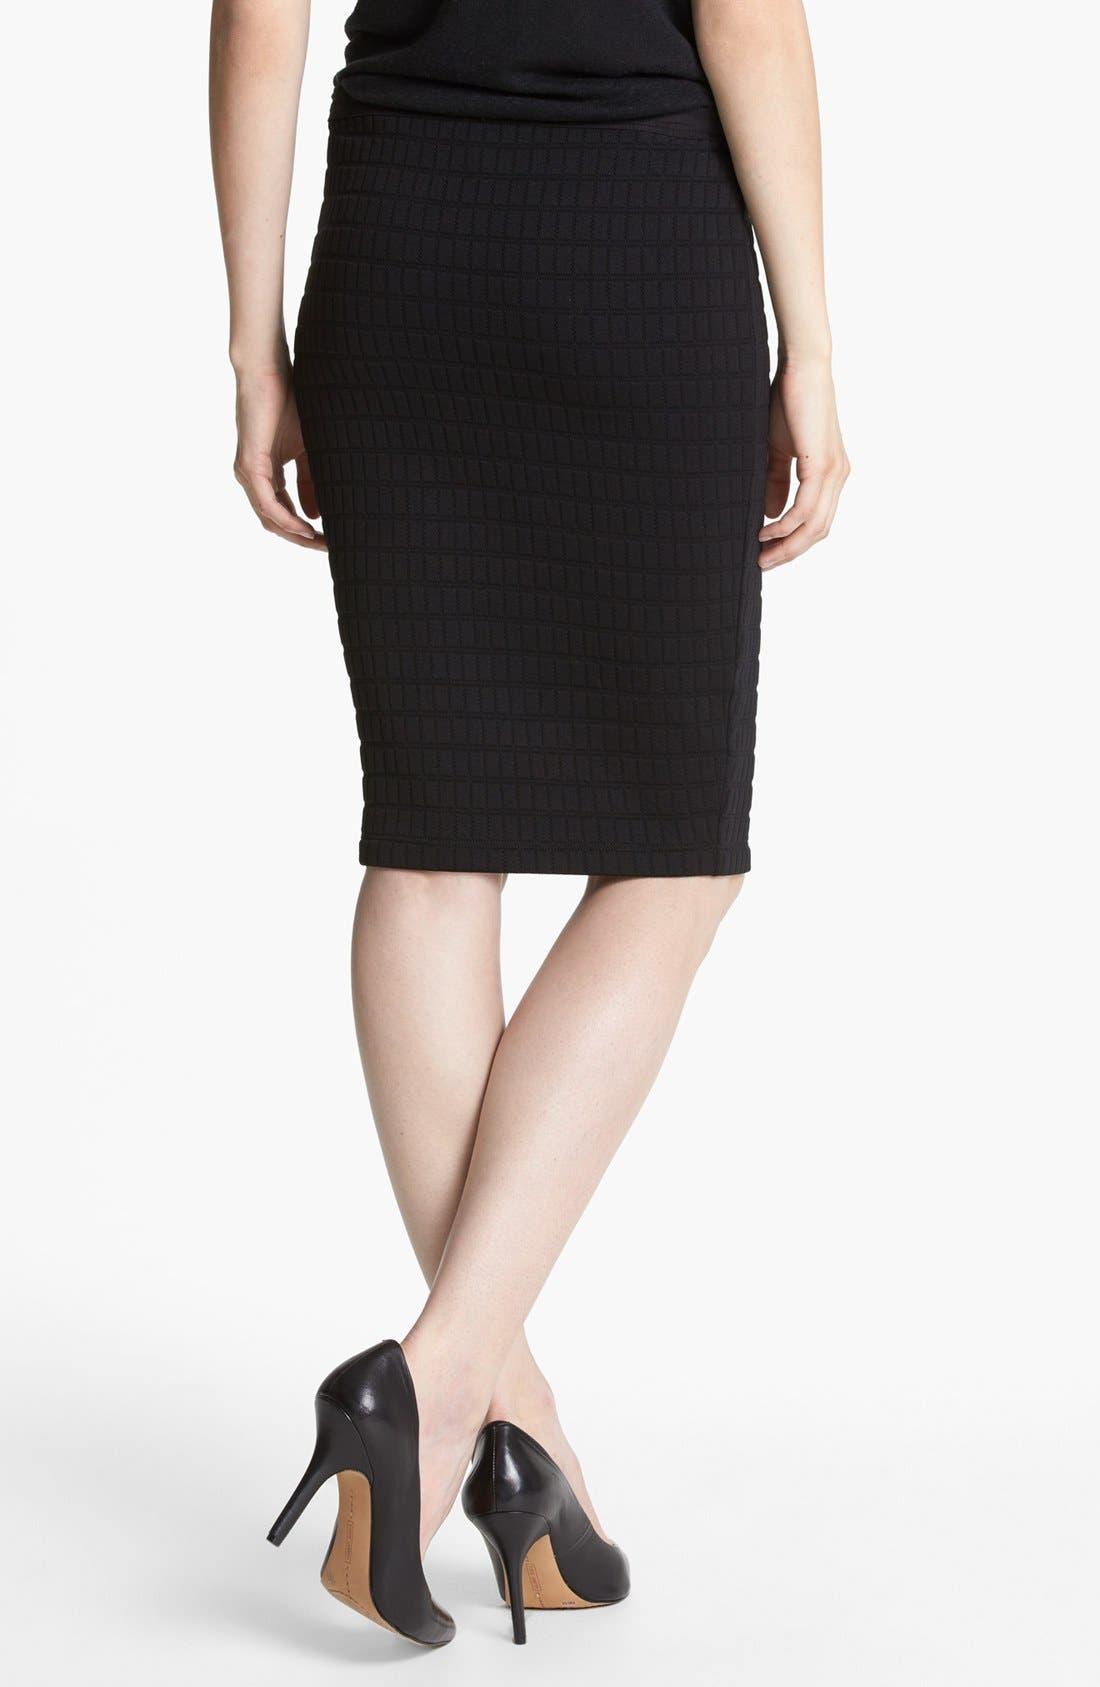 Alternate Image 2  - Bailey 44 'Scanner' Textured Pencil Skirt